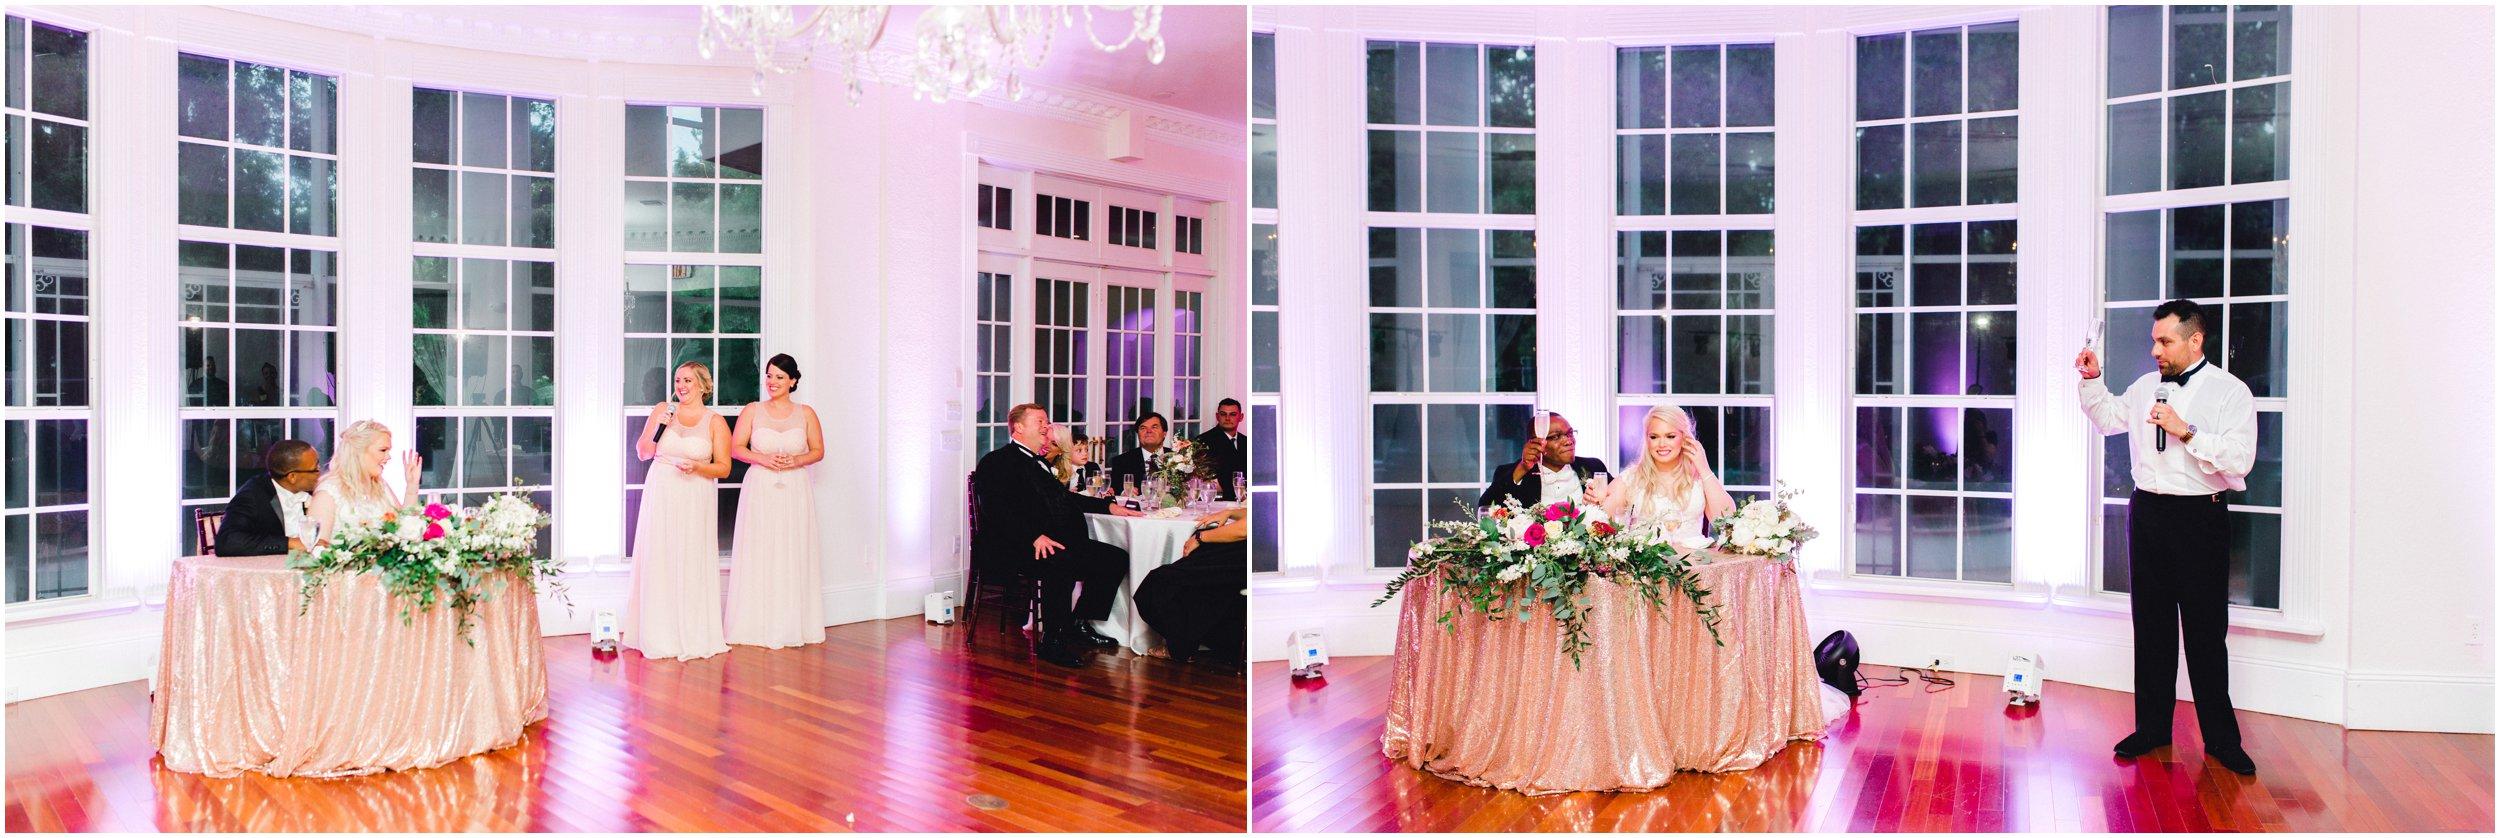 luxmore-grande-estate-orlando-wedding-photographer_0057.jpg